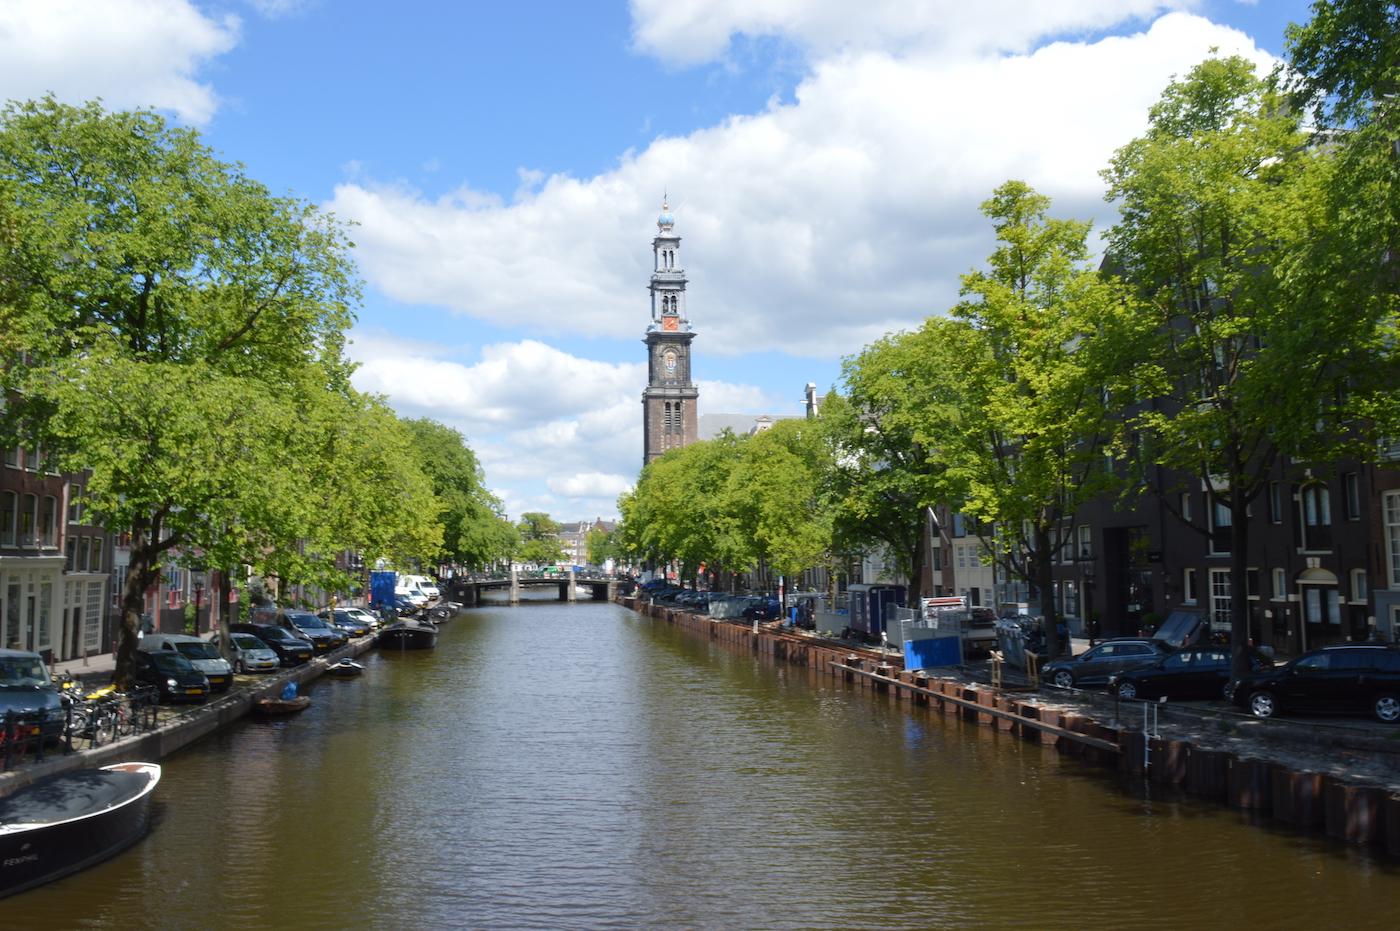 mooiste plekken nederland Amsterdamse grachten met Westerkerk